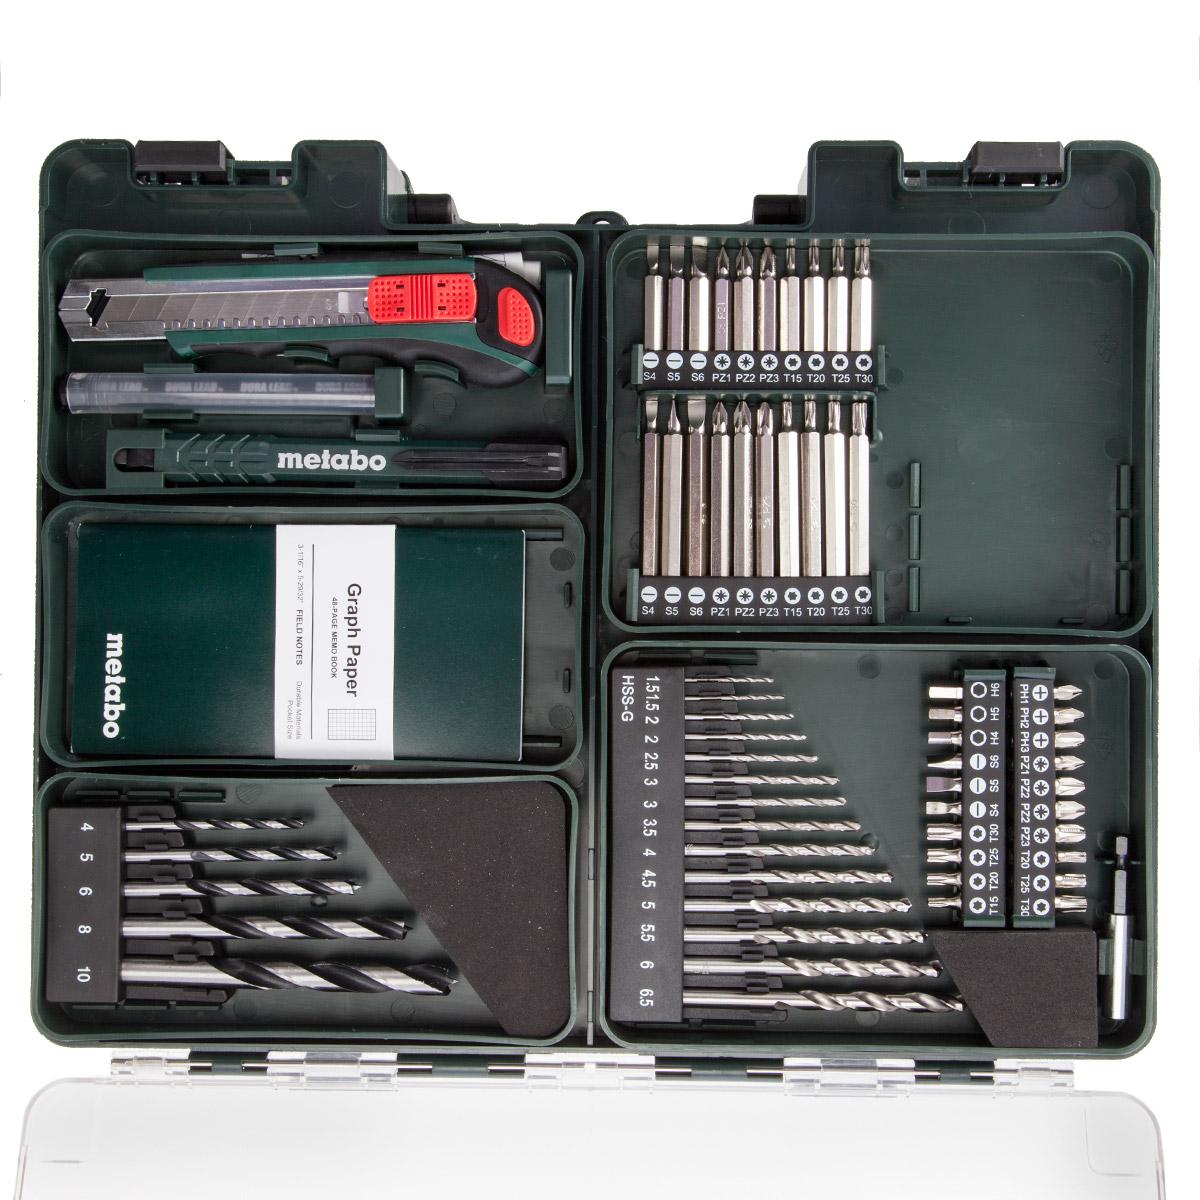 600157880 powermaxx bs quick pro с набором оснастки